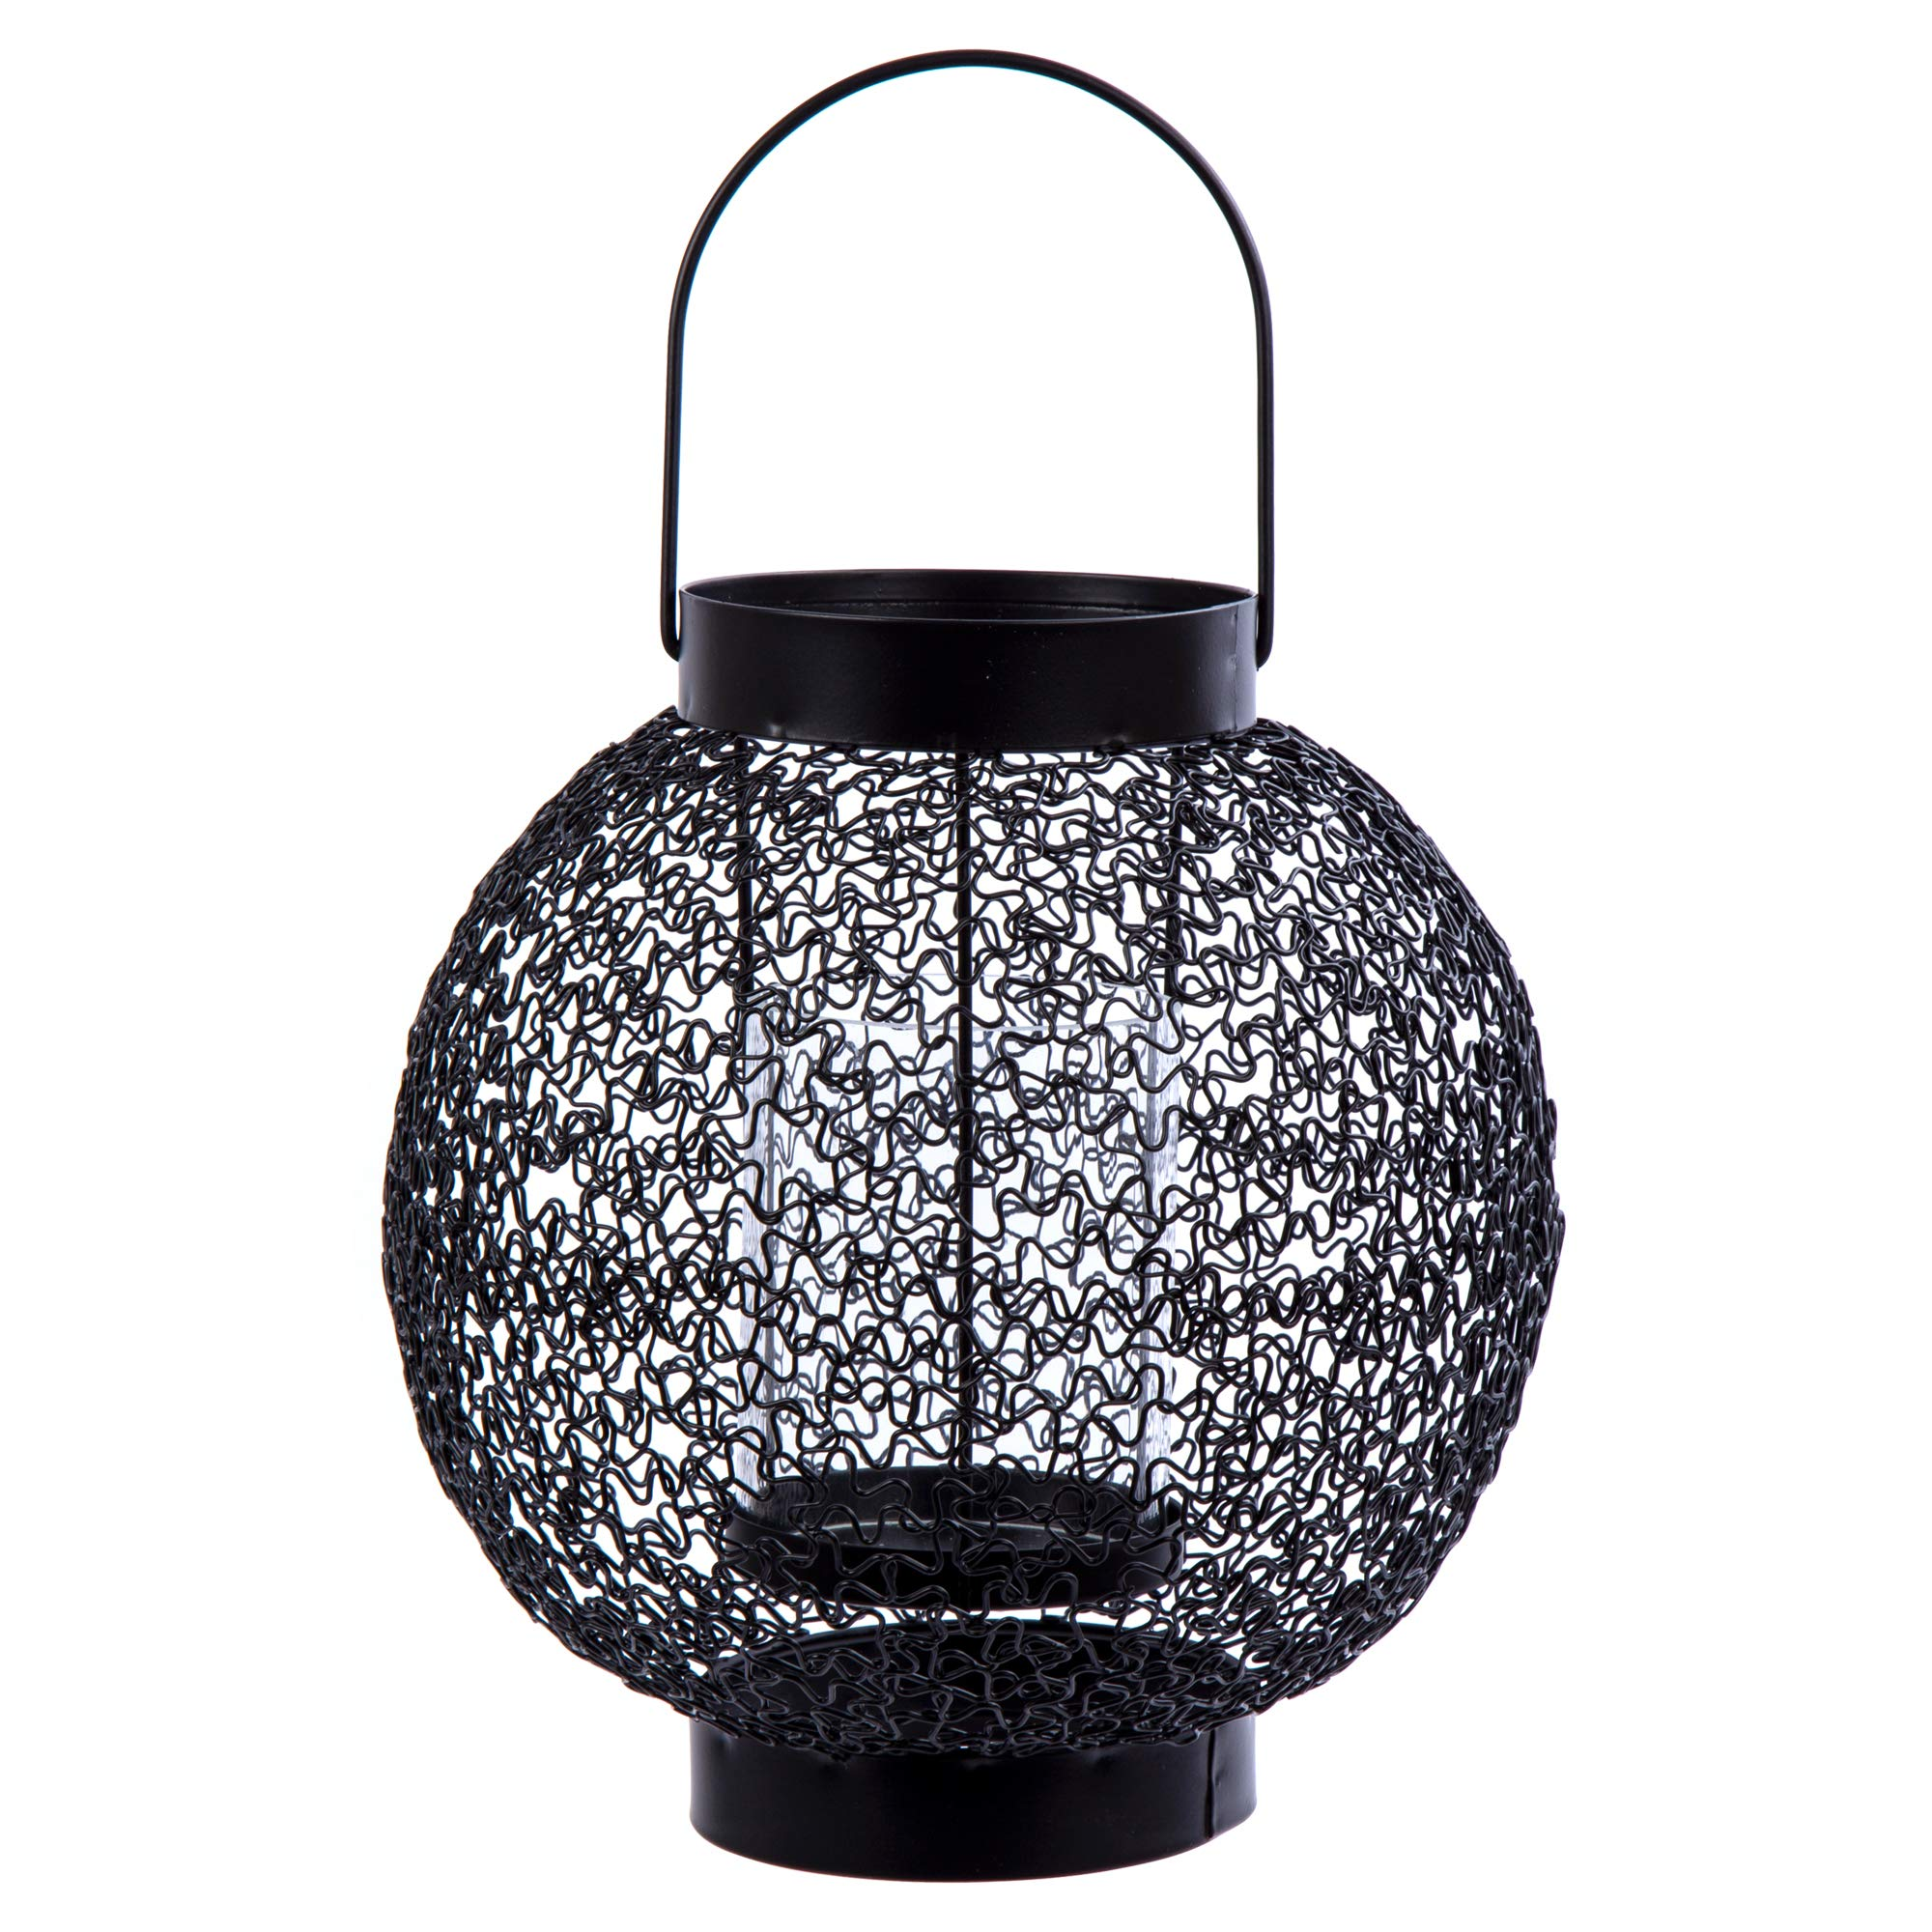 Truu Design, 7 inches, Metal Candle Holder, Black